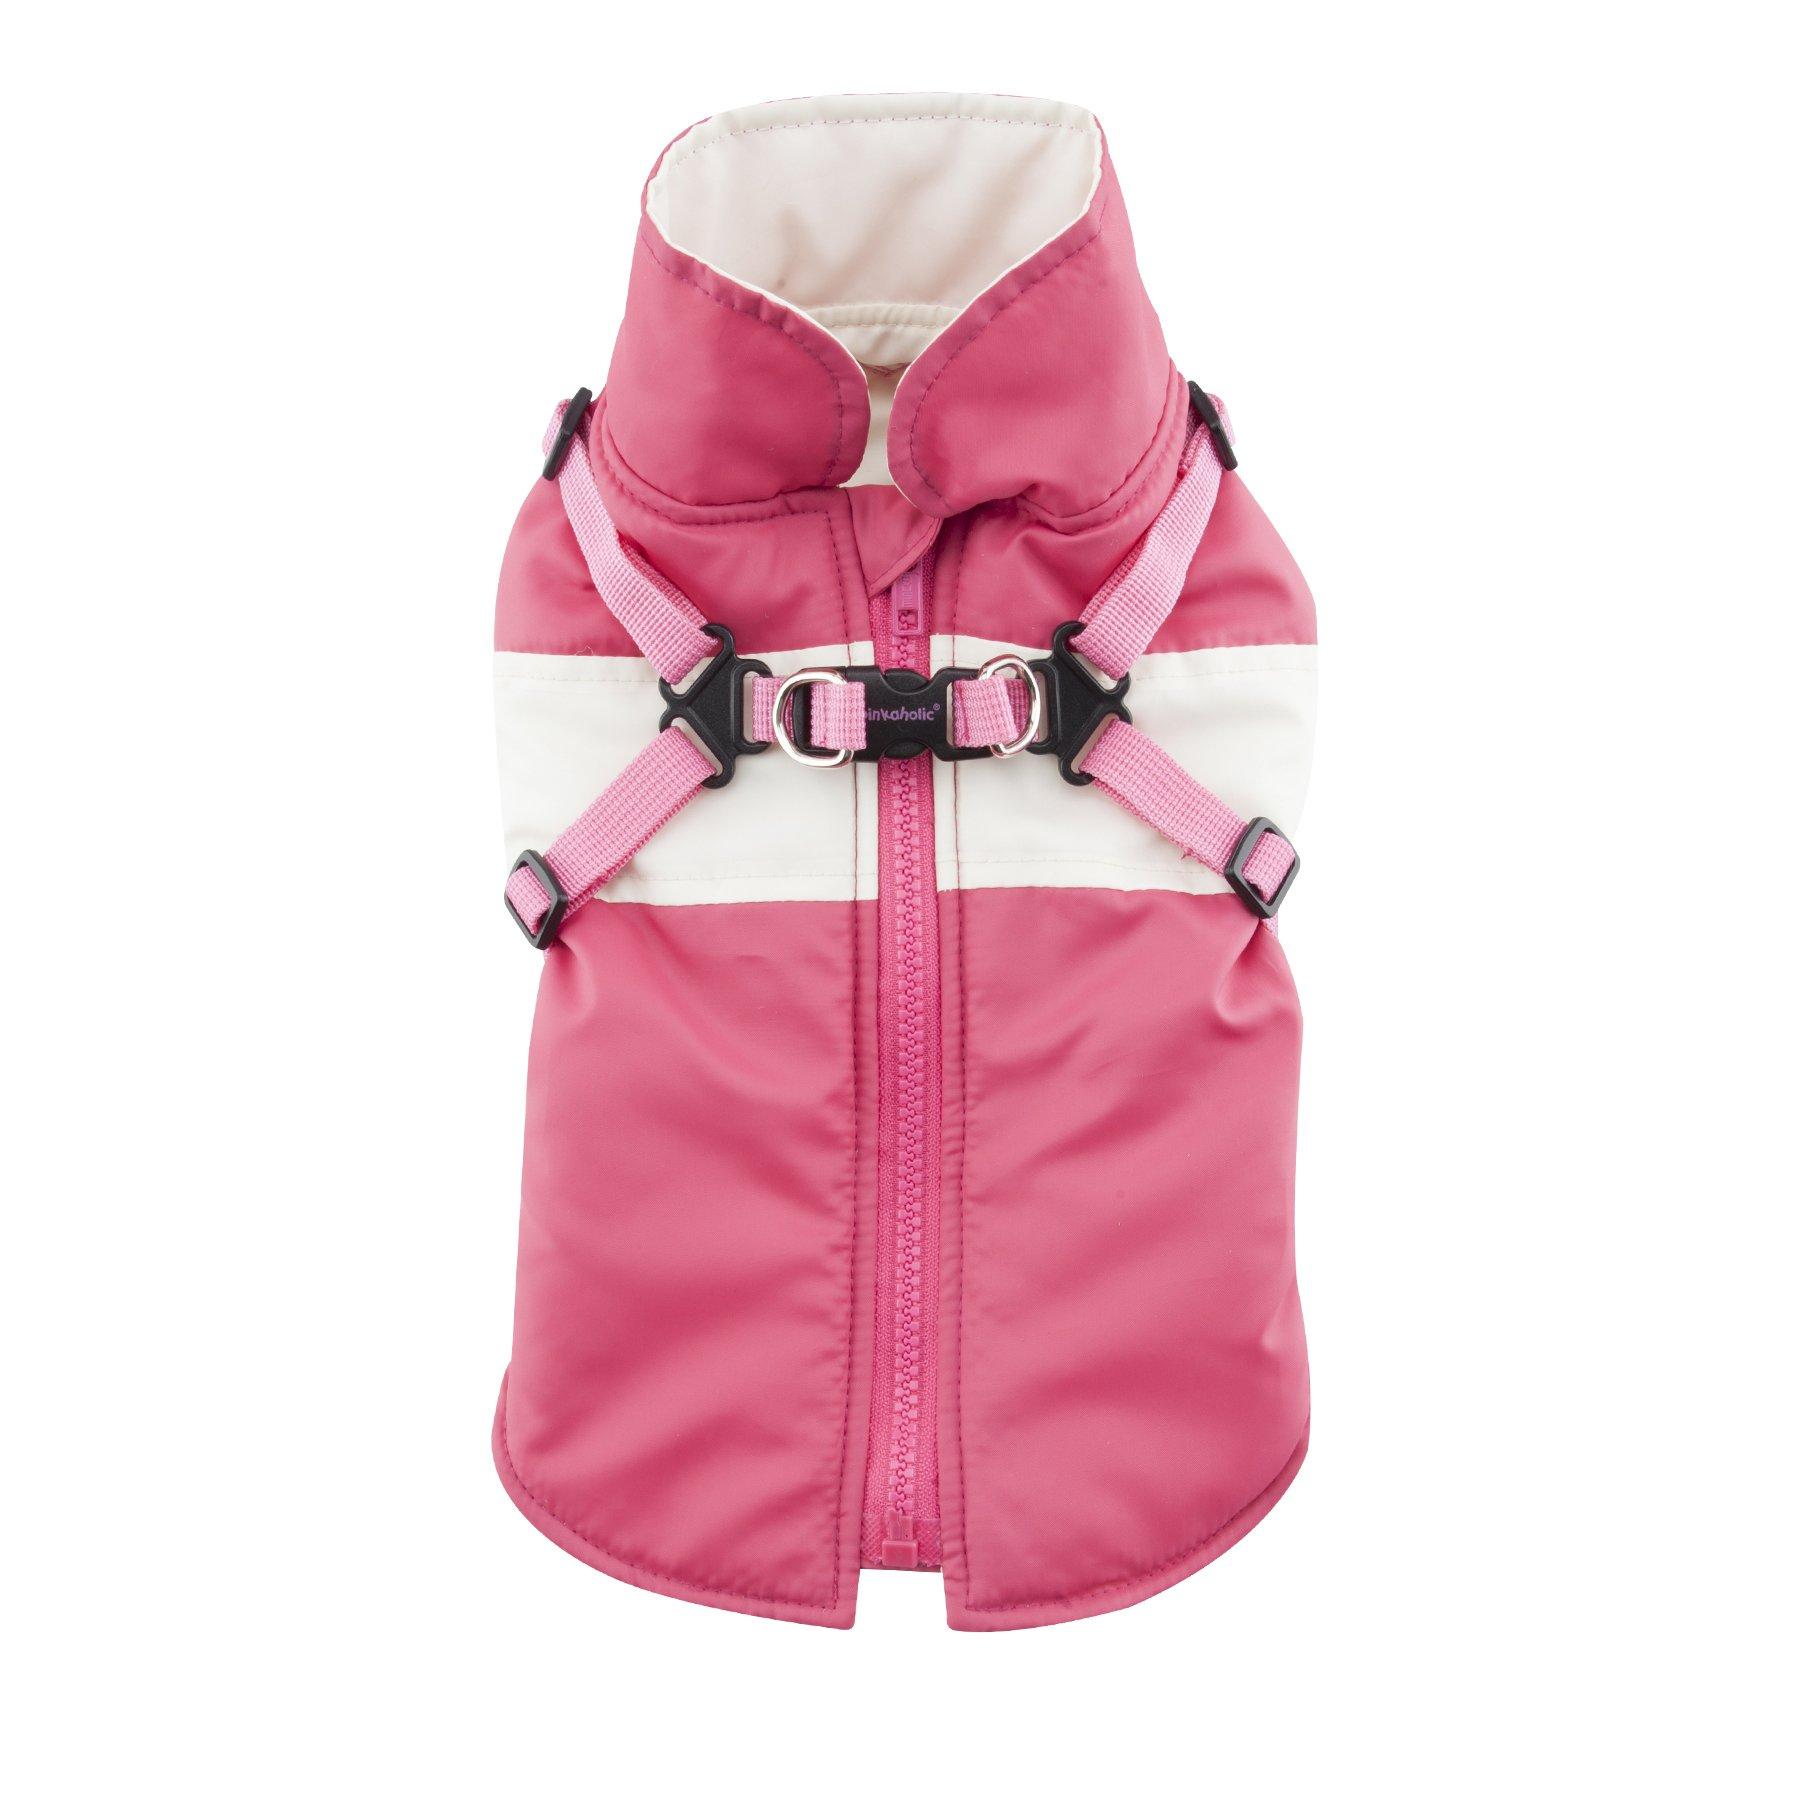 Pinkaholic New York Aiden Winter Fleece Vest, Medium, Pink